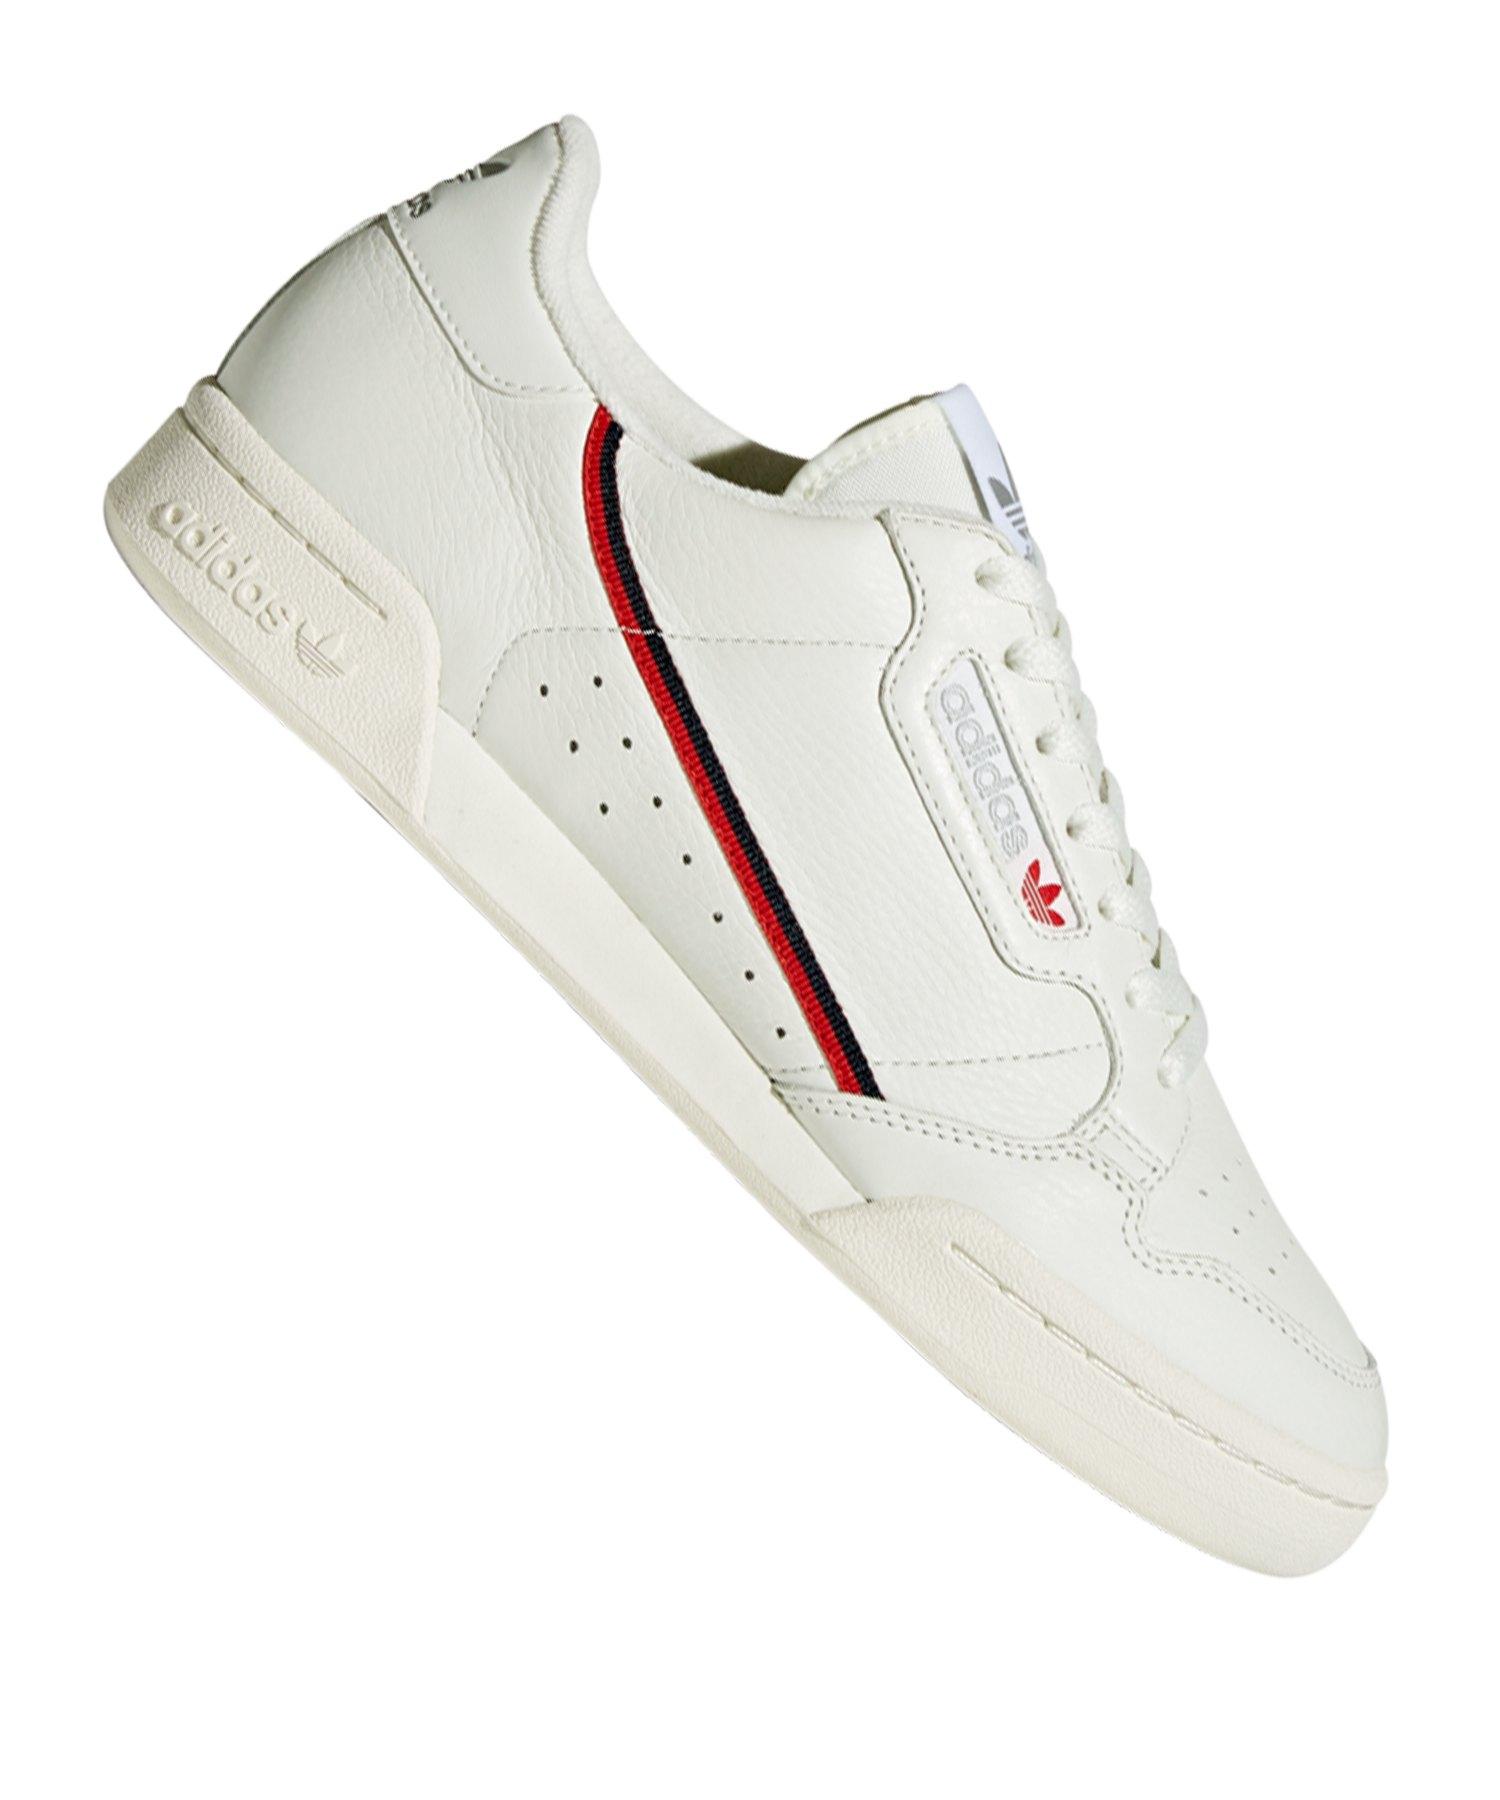 Herren adidas Weiß rot Continental 80 Sneaker